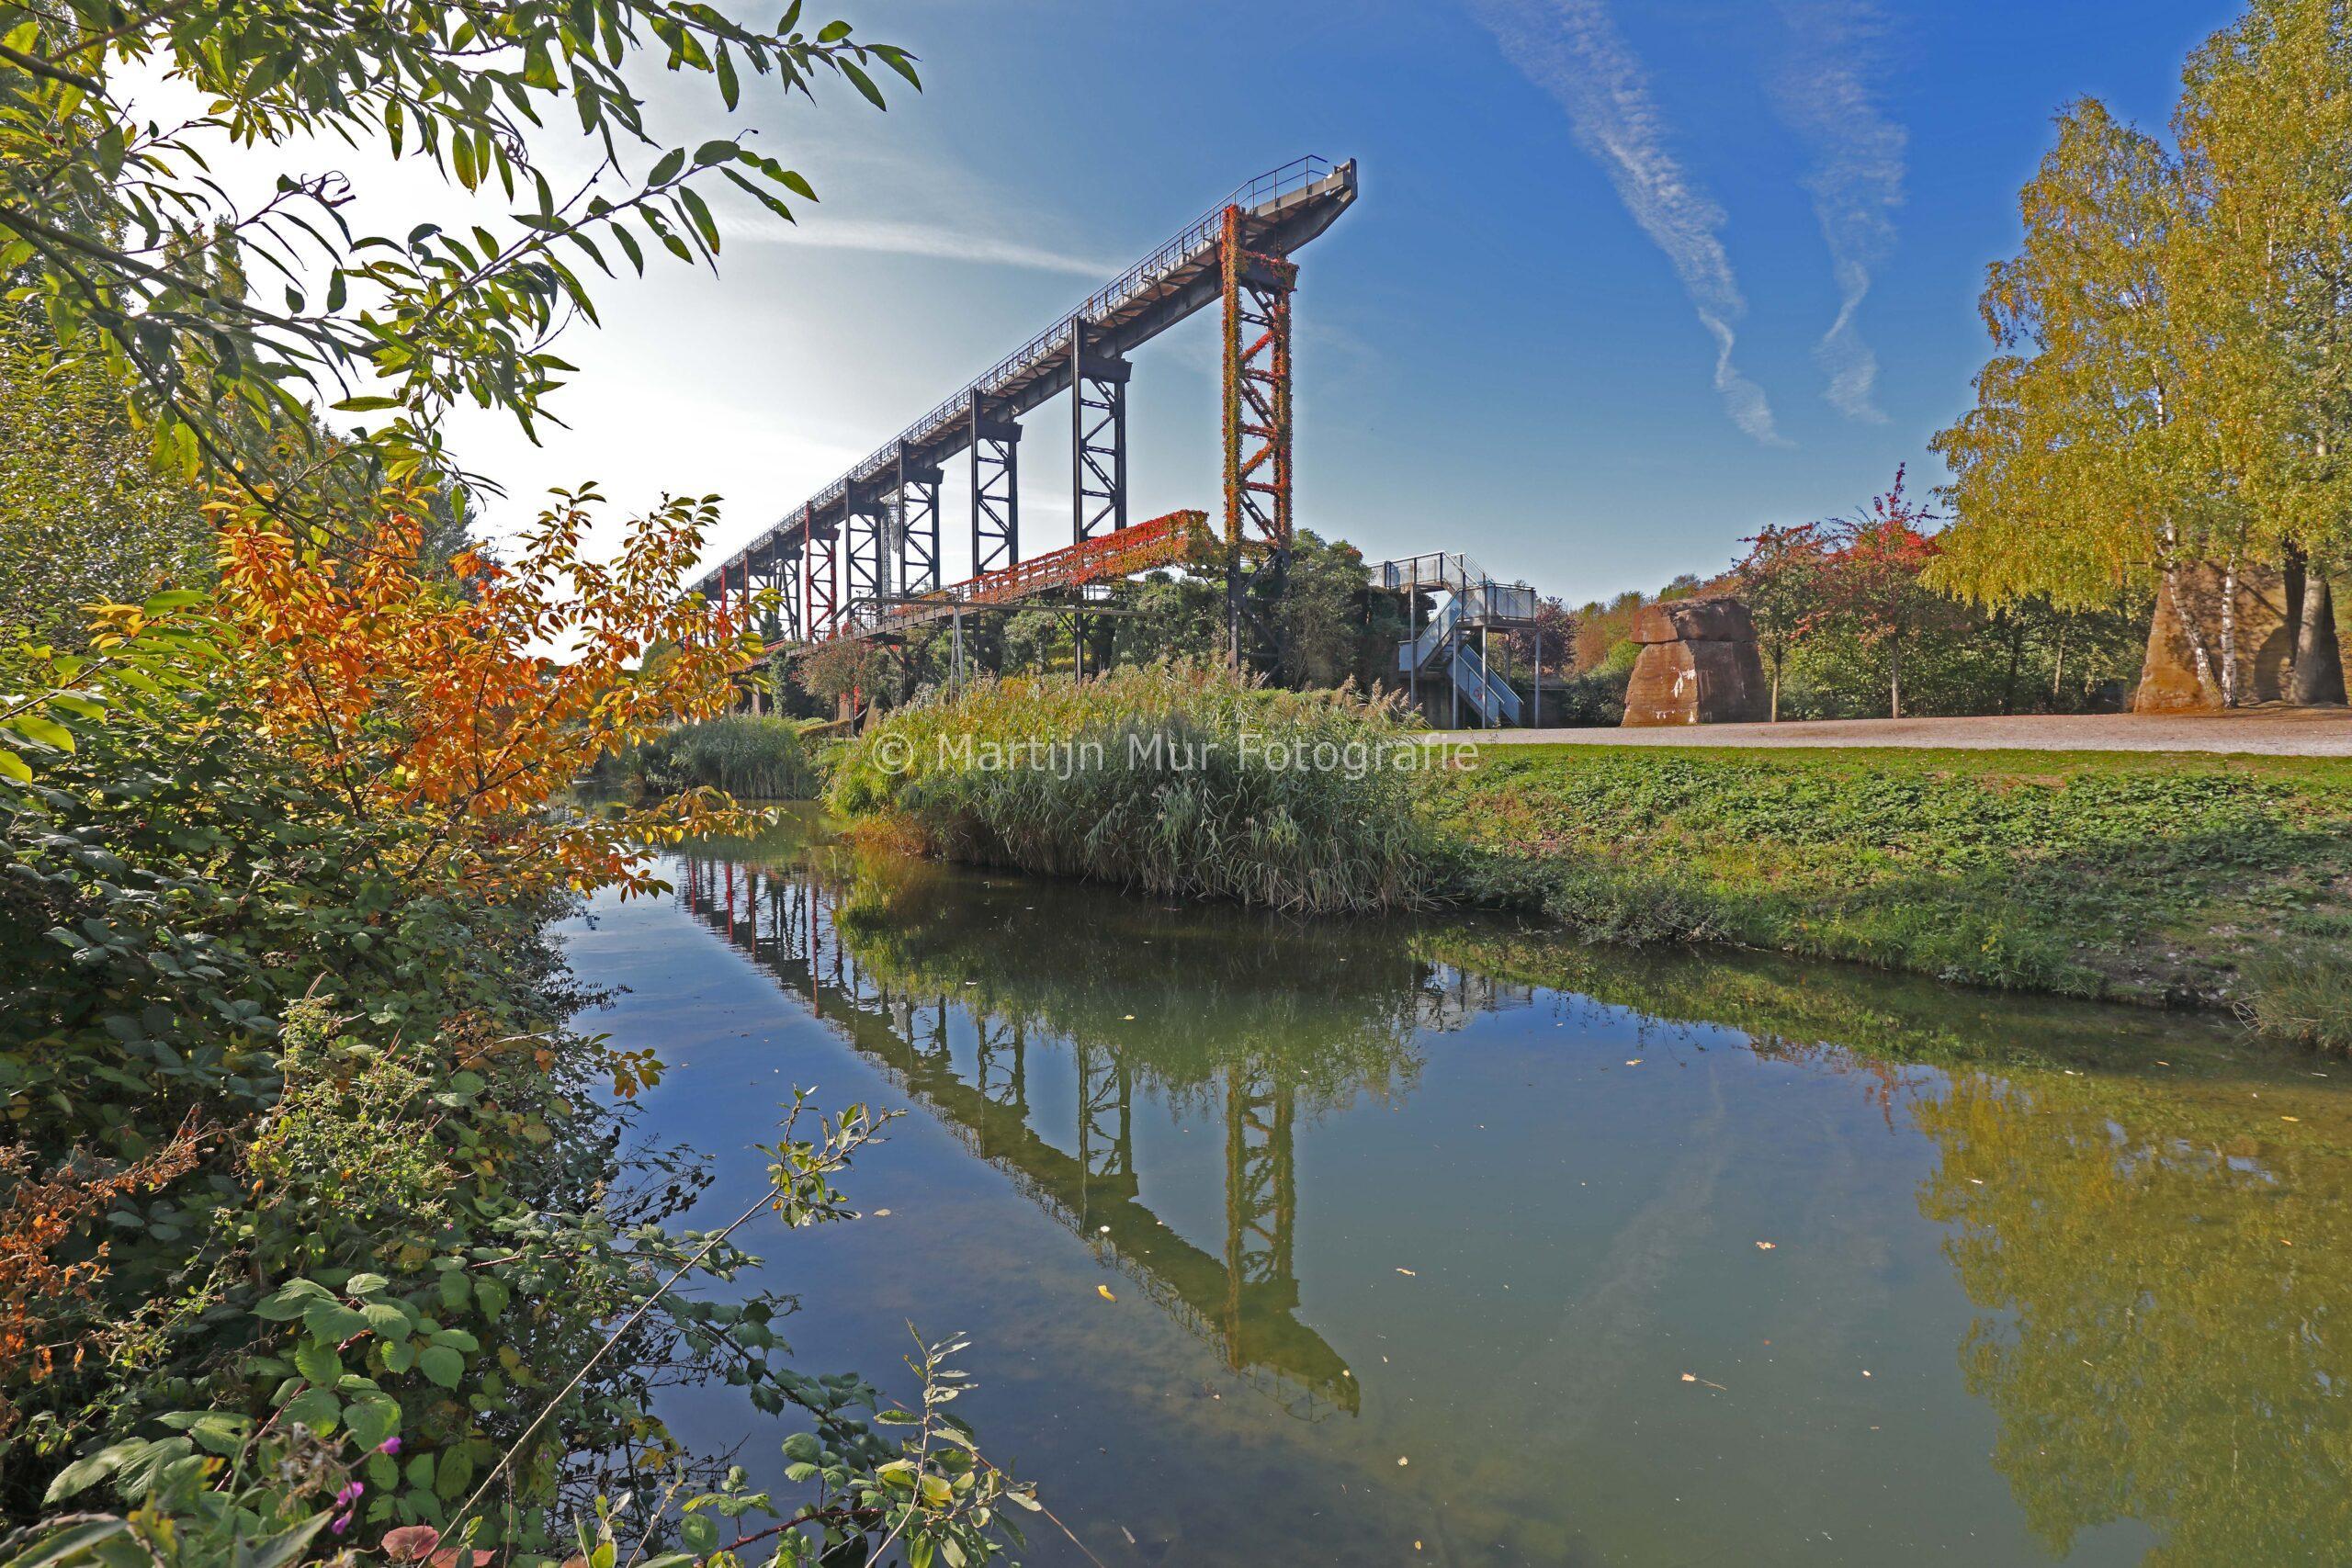 industriële fotografie, contrast, groen en staal, kunst te koop, foto's te koop